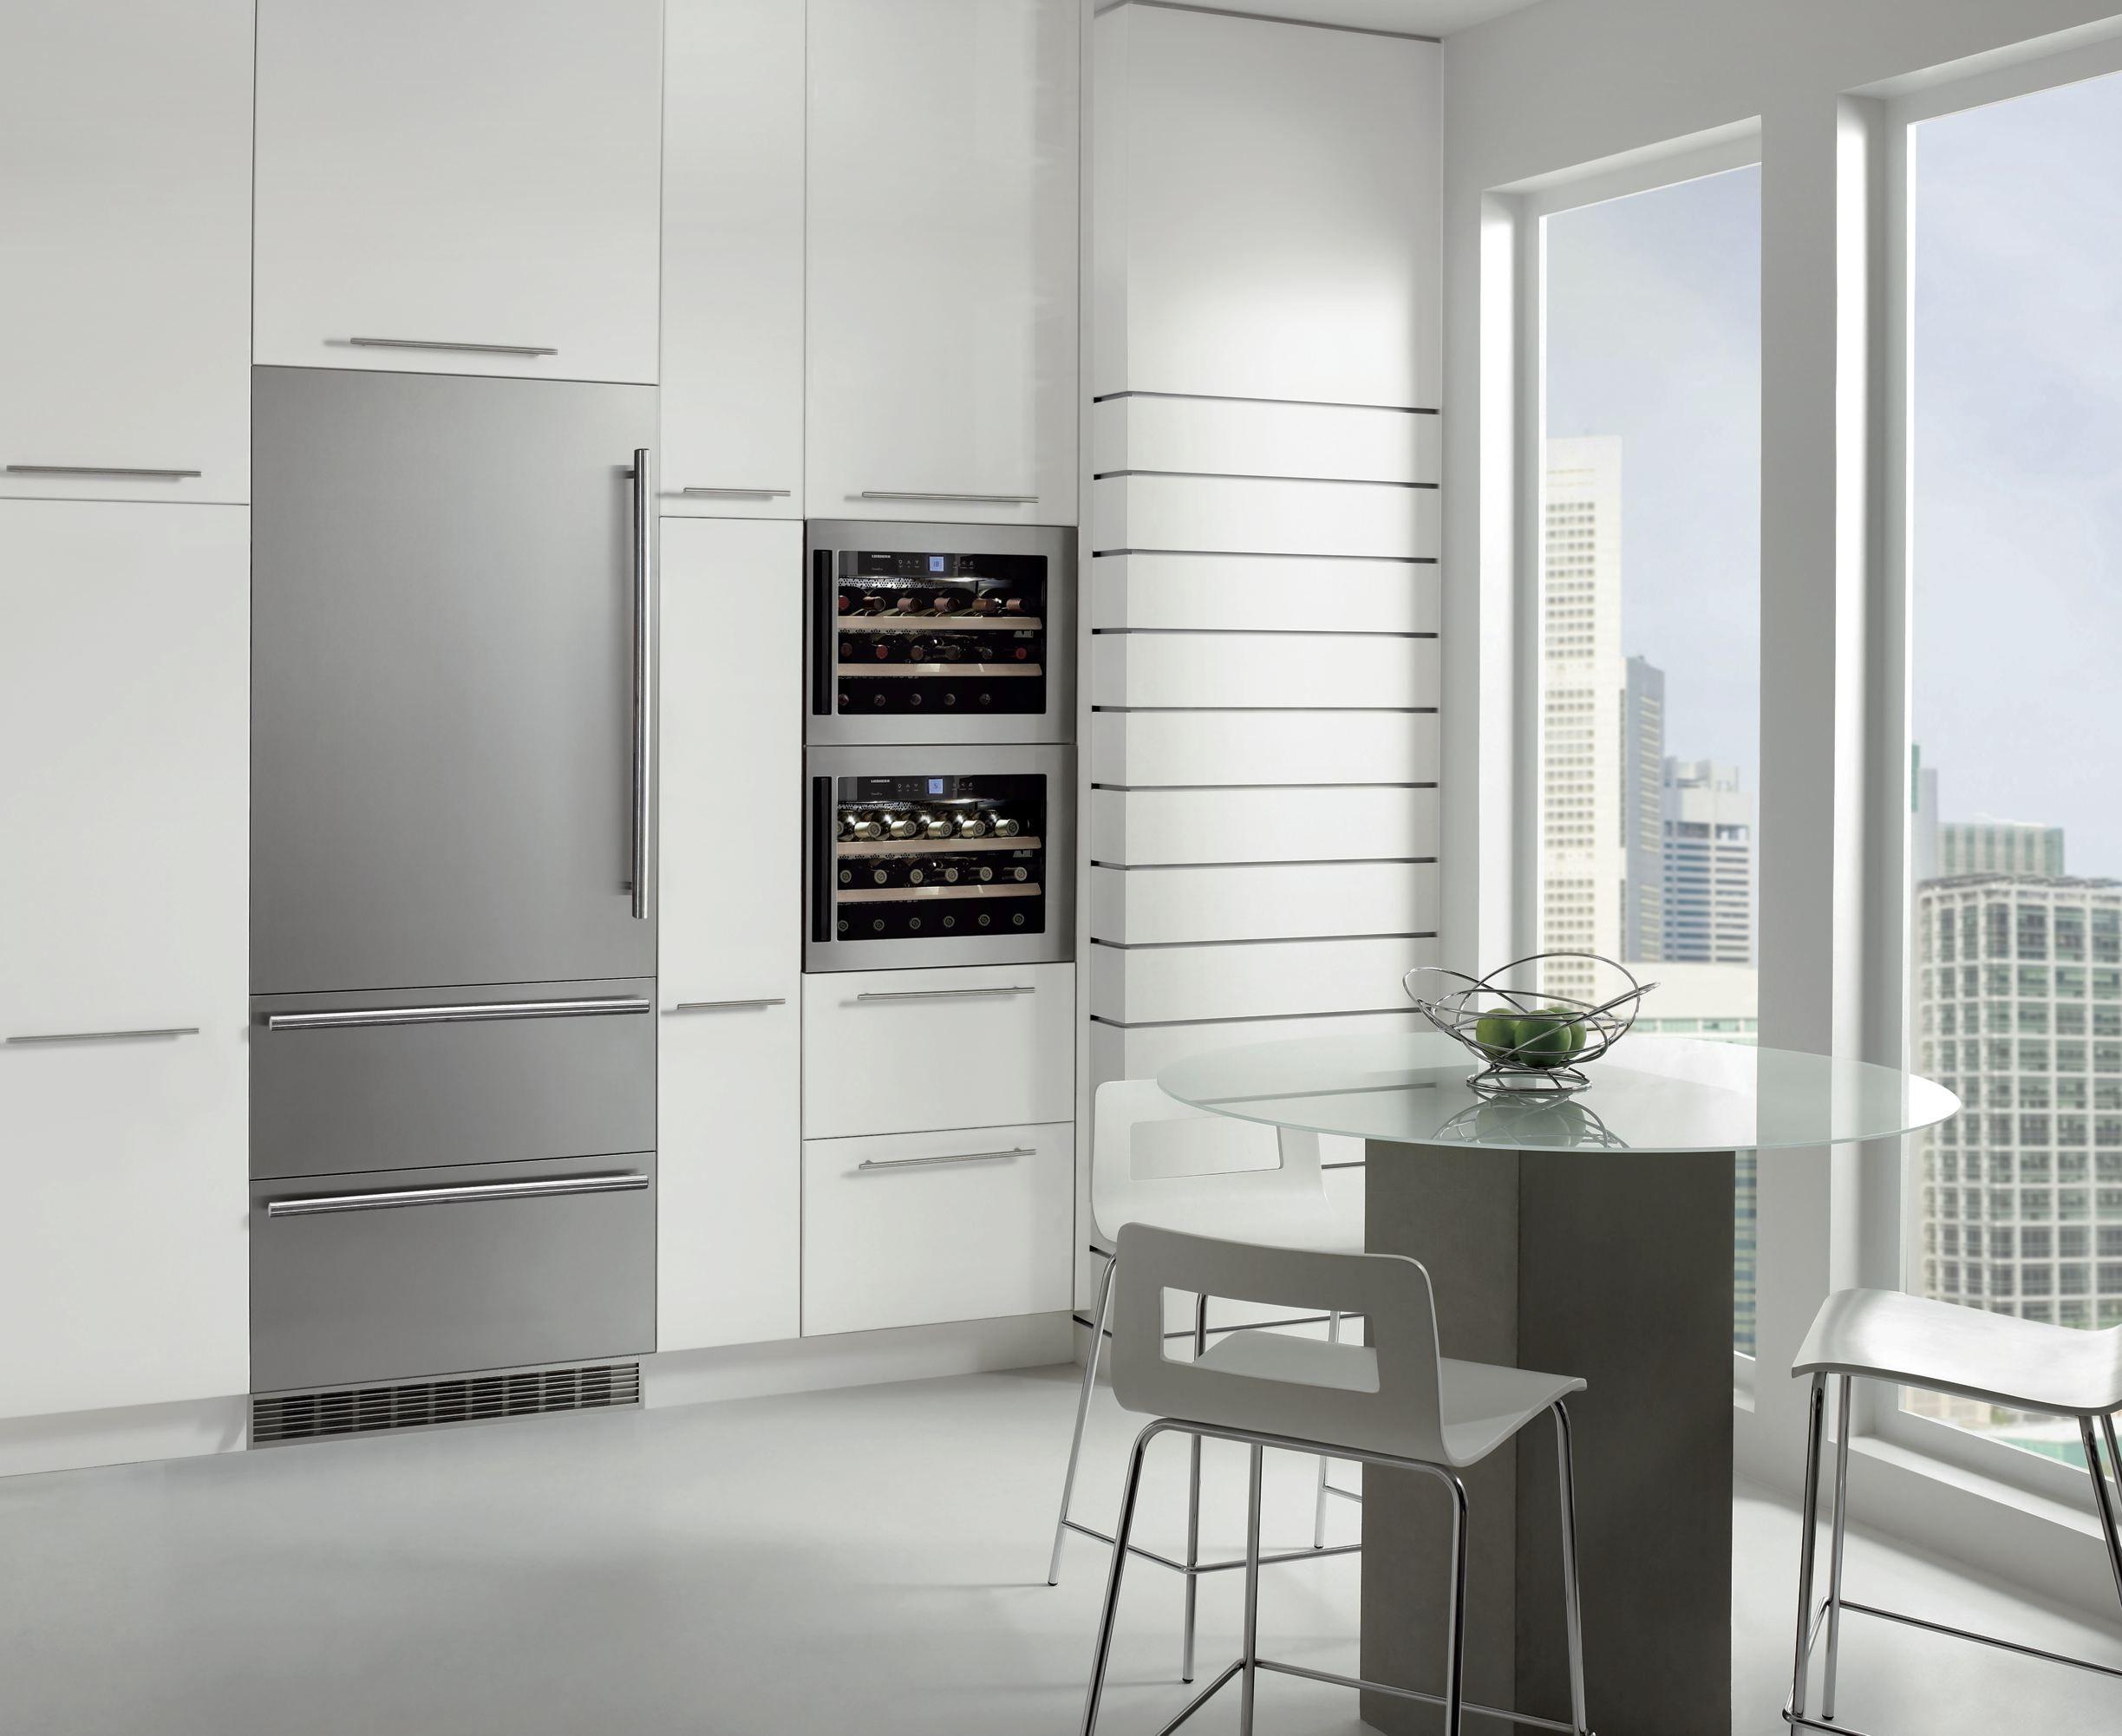 liebherr ecbn 5066 75 cm built in premiumplus biofresh. Black Bedroom Furniture Sets. Home Design Ideas